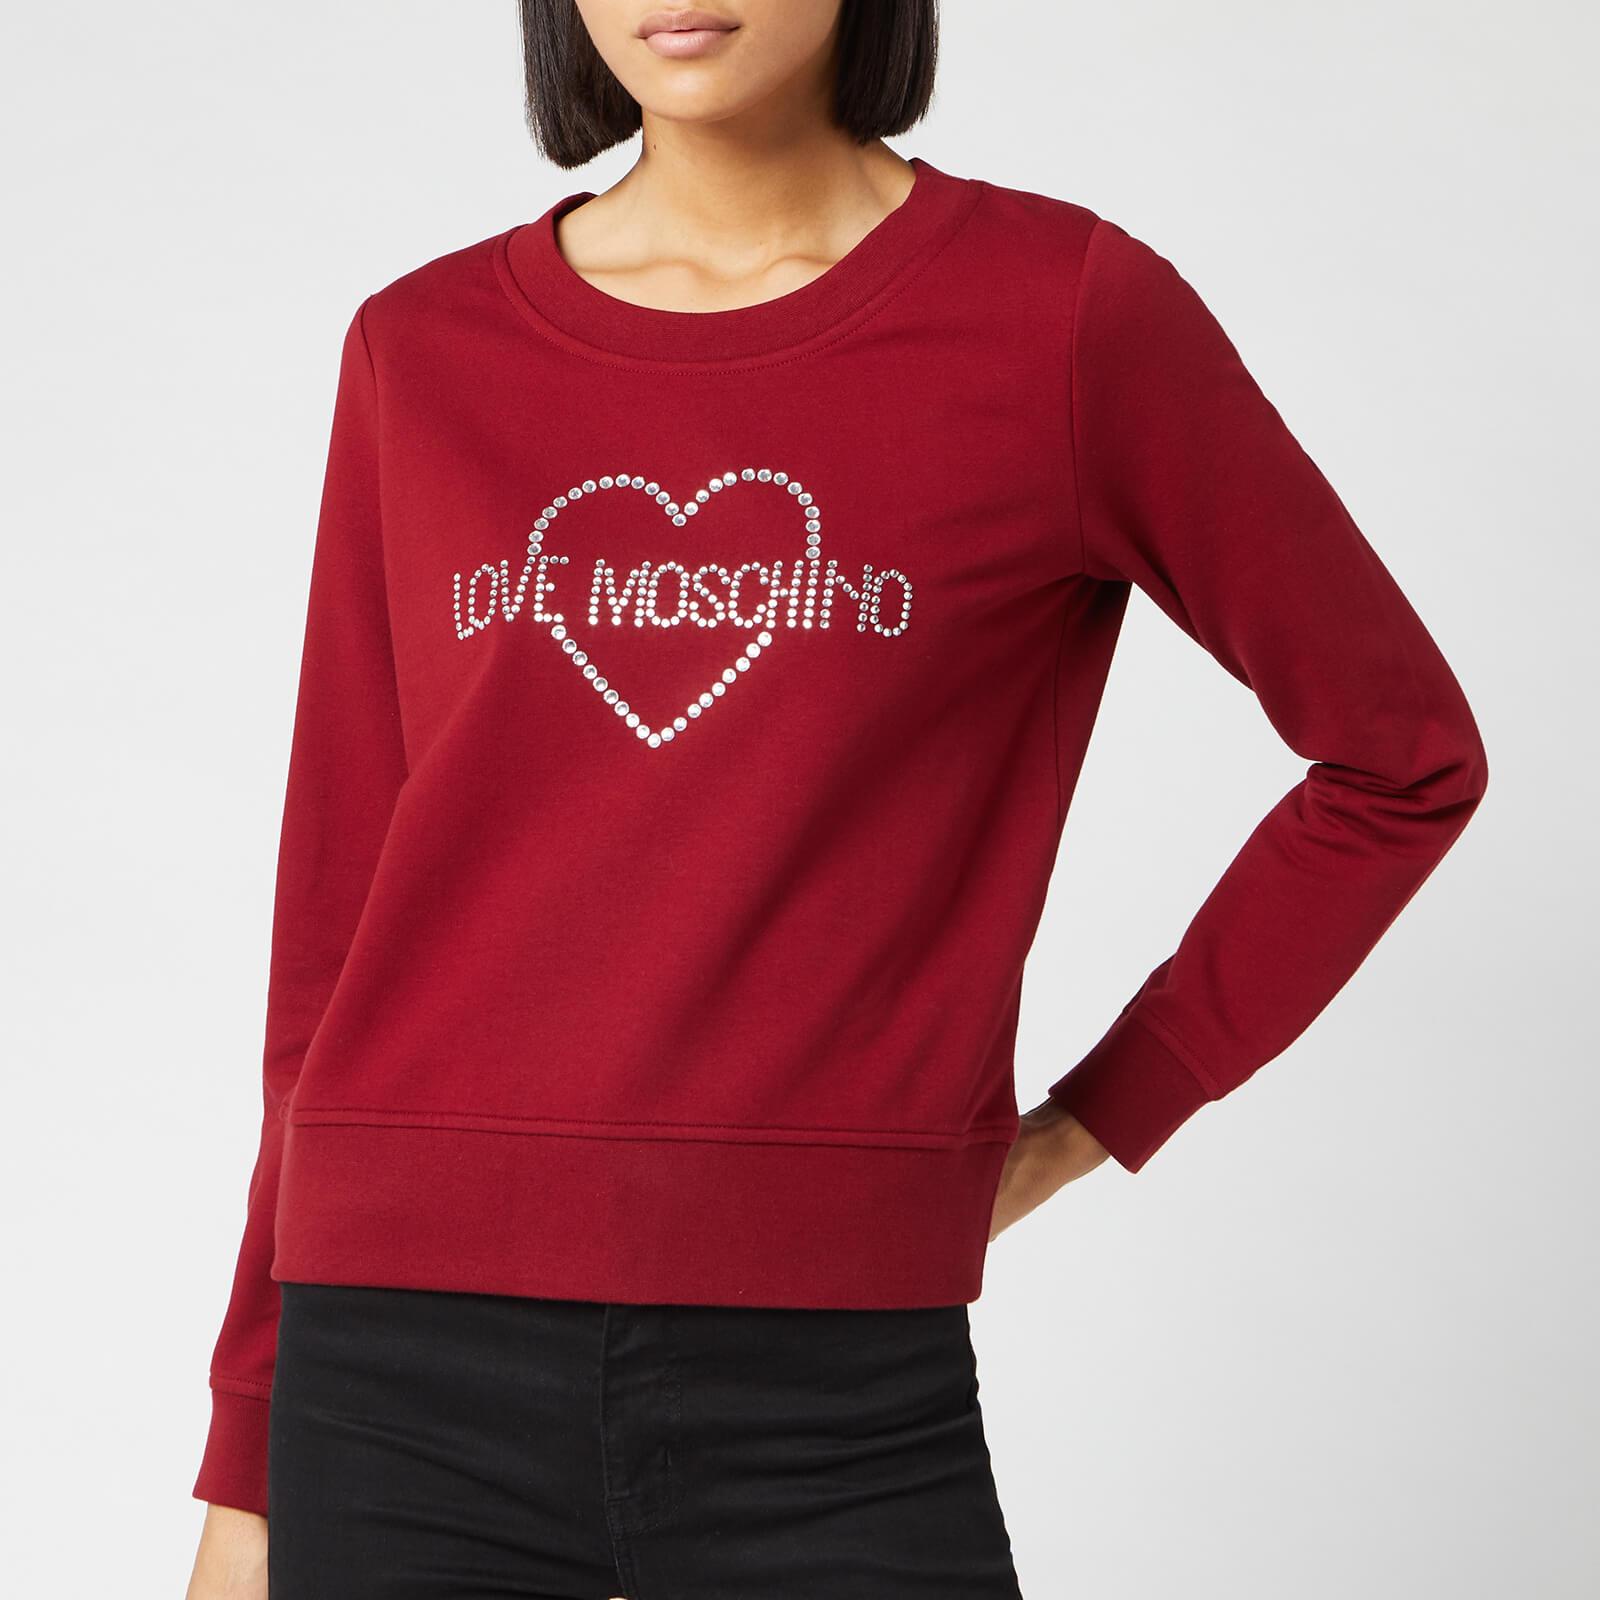 Moschino Love Moschino Women's Crystal Logo Sweater - Red - IT 42/UK 10 - Red